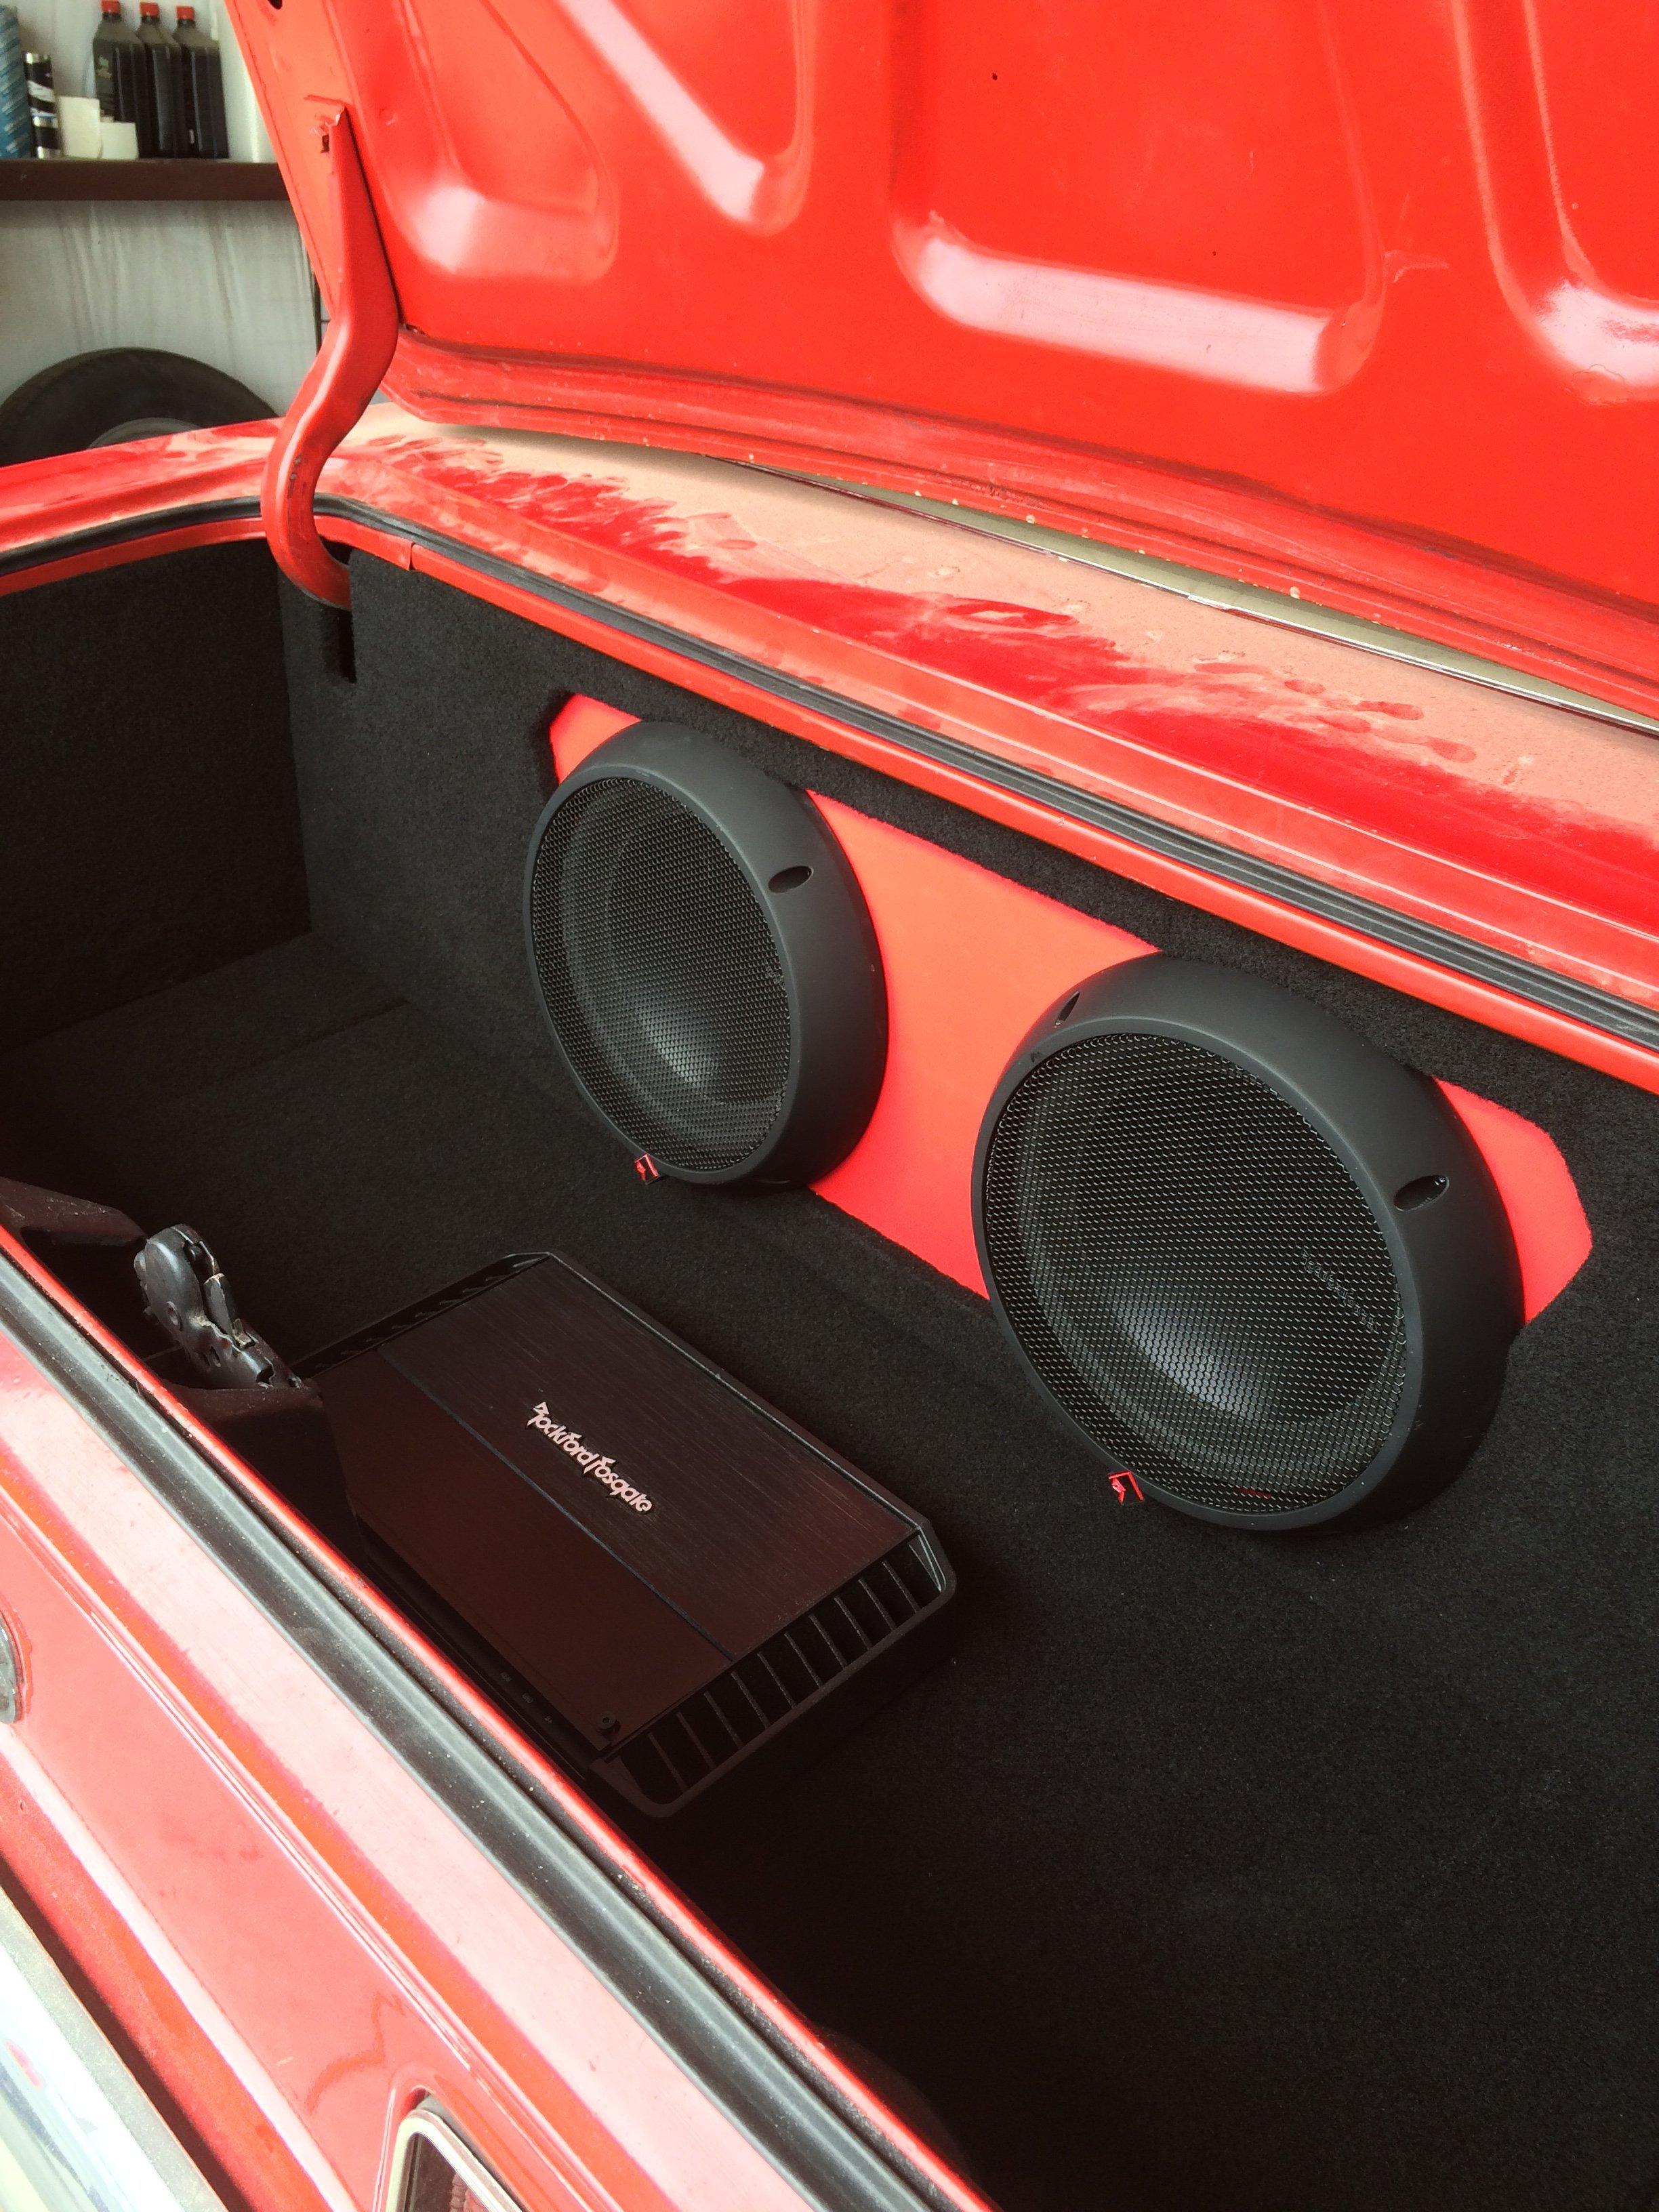 car stereo system Midland, TX